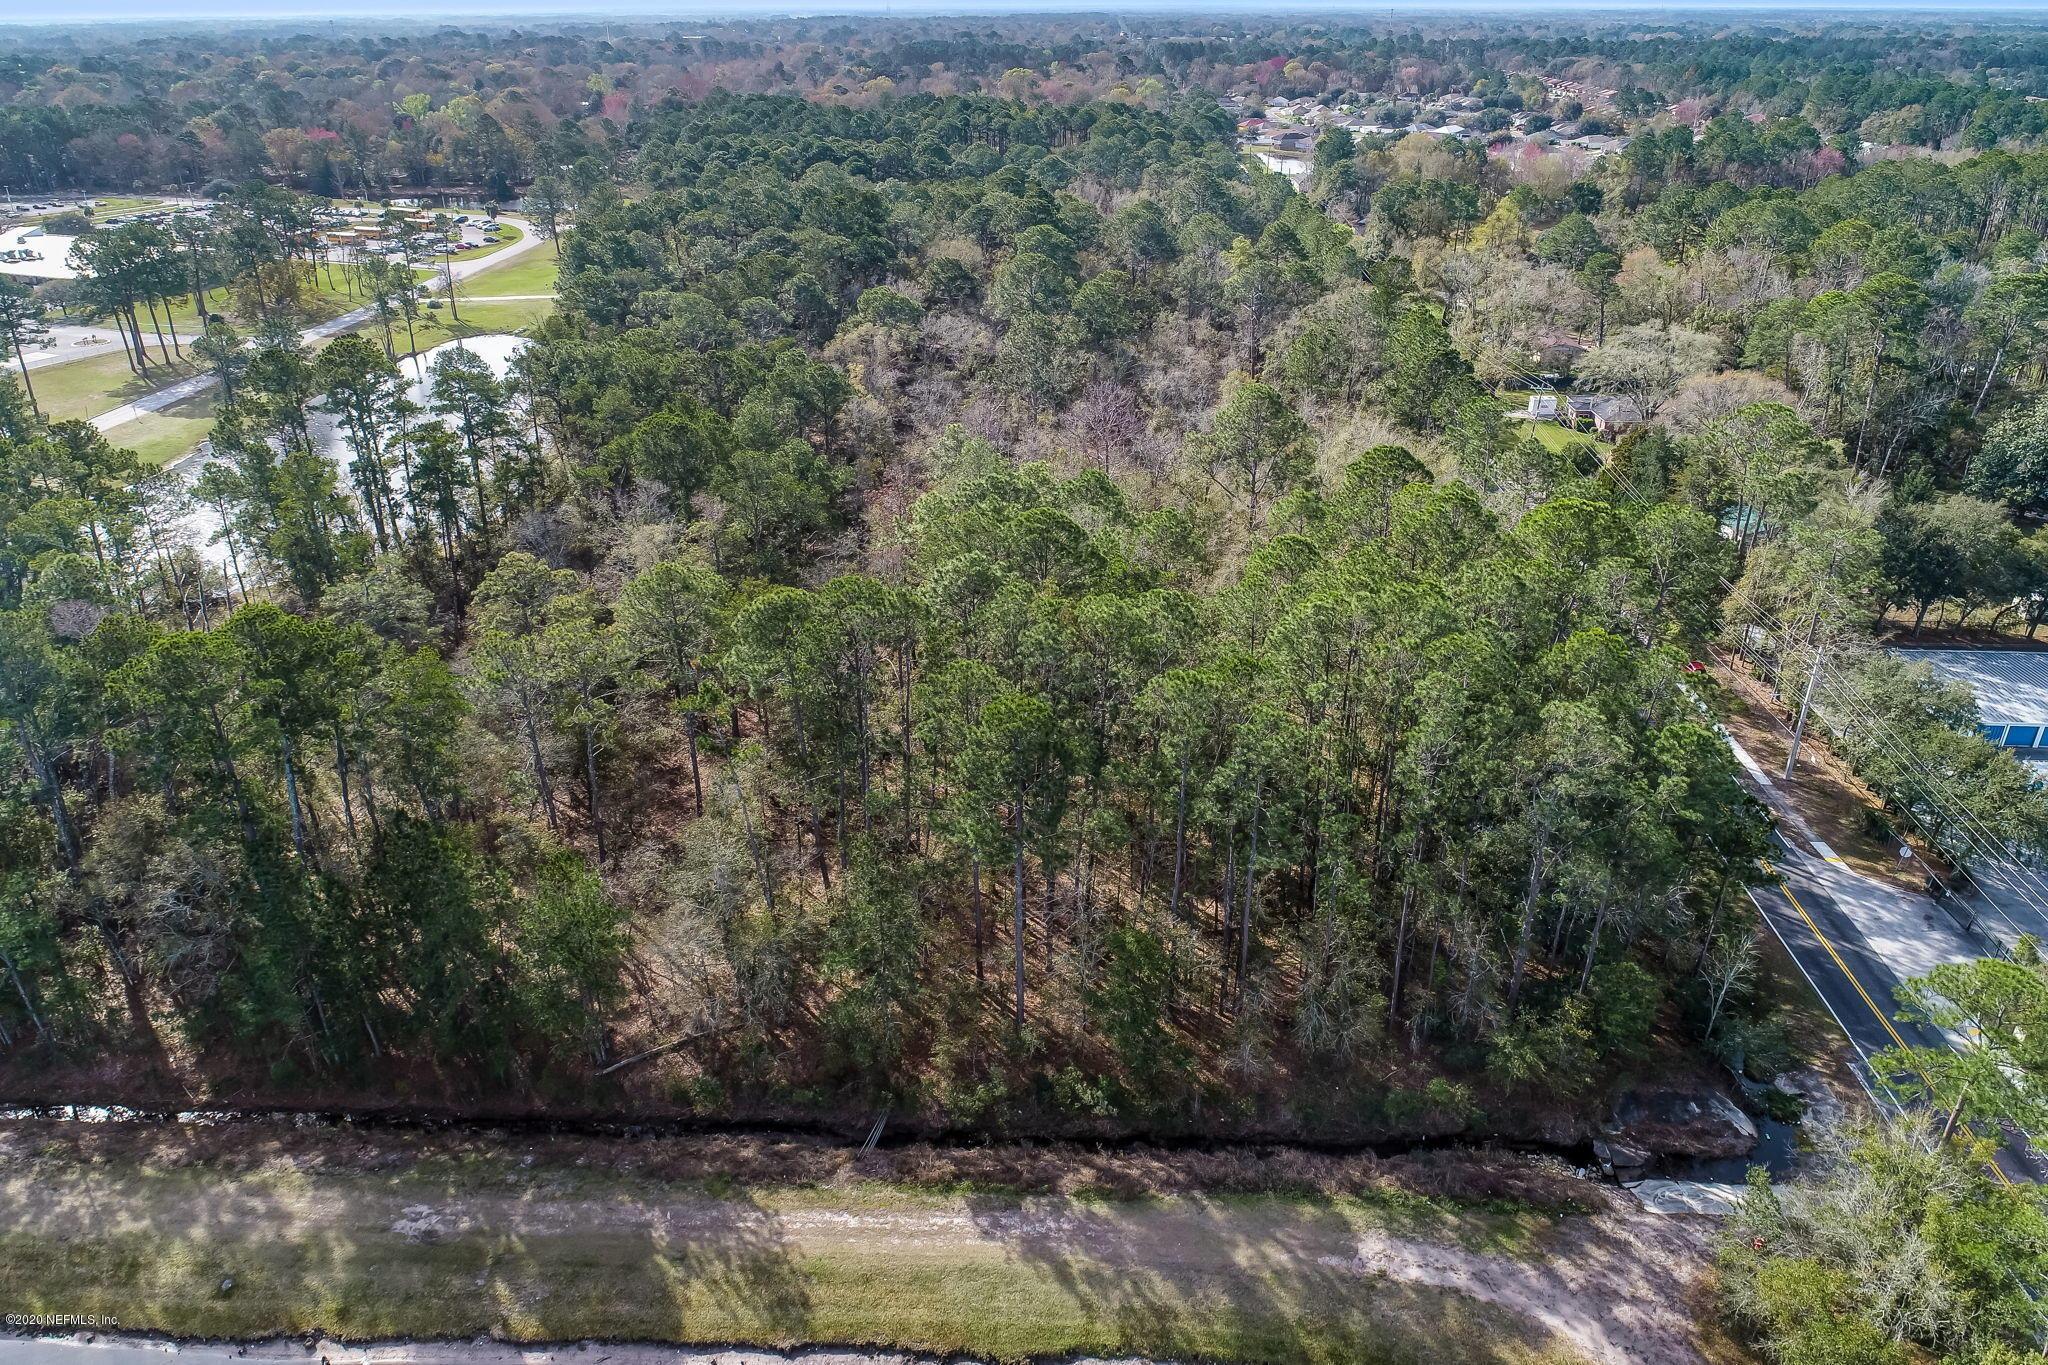 0 RICKER LOT 3 & 4, JACKSONVILLE, FLORIDA 32210, ,Vacant land,For sale,RICKER LOT 3 & 4,1082592